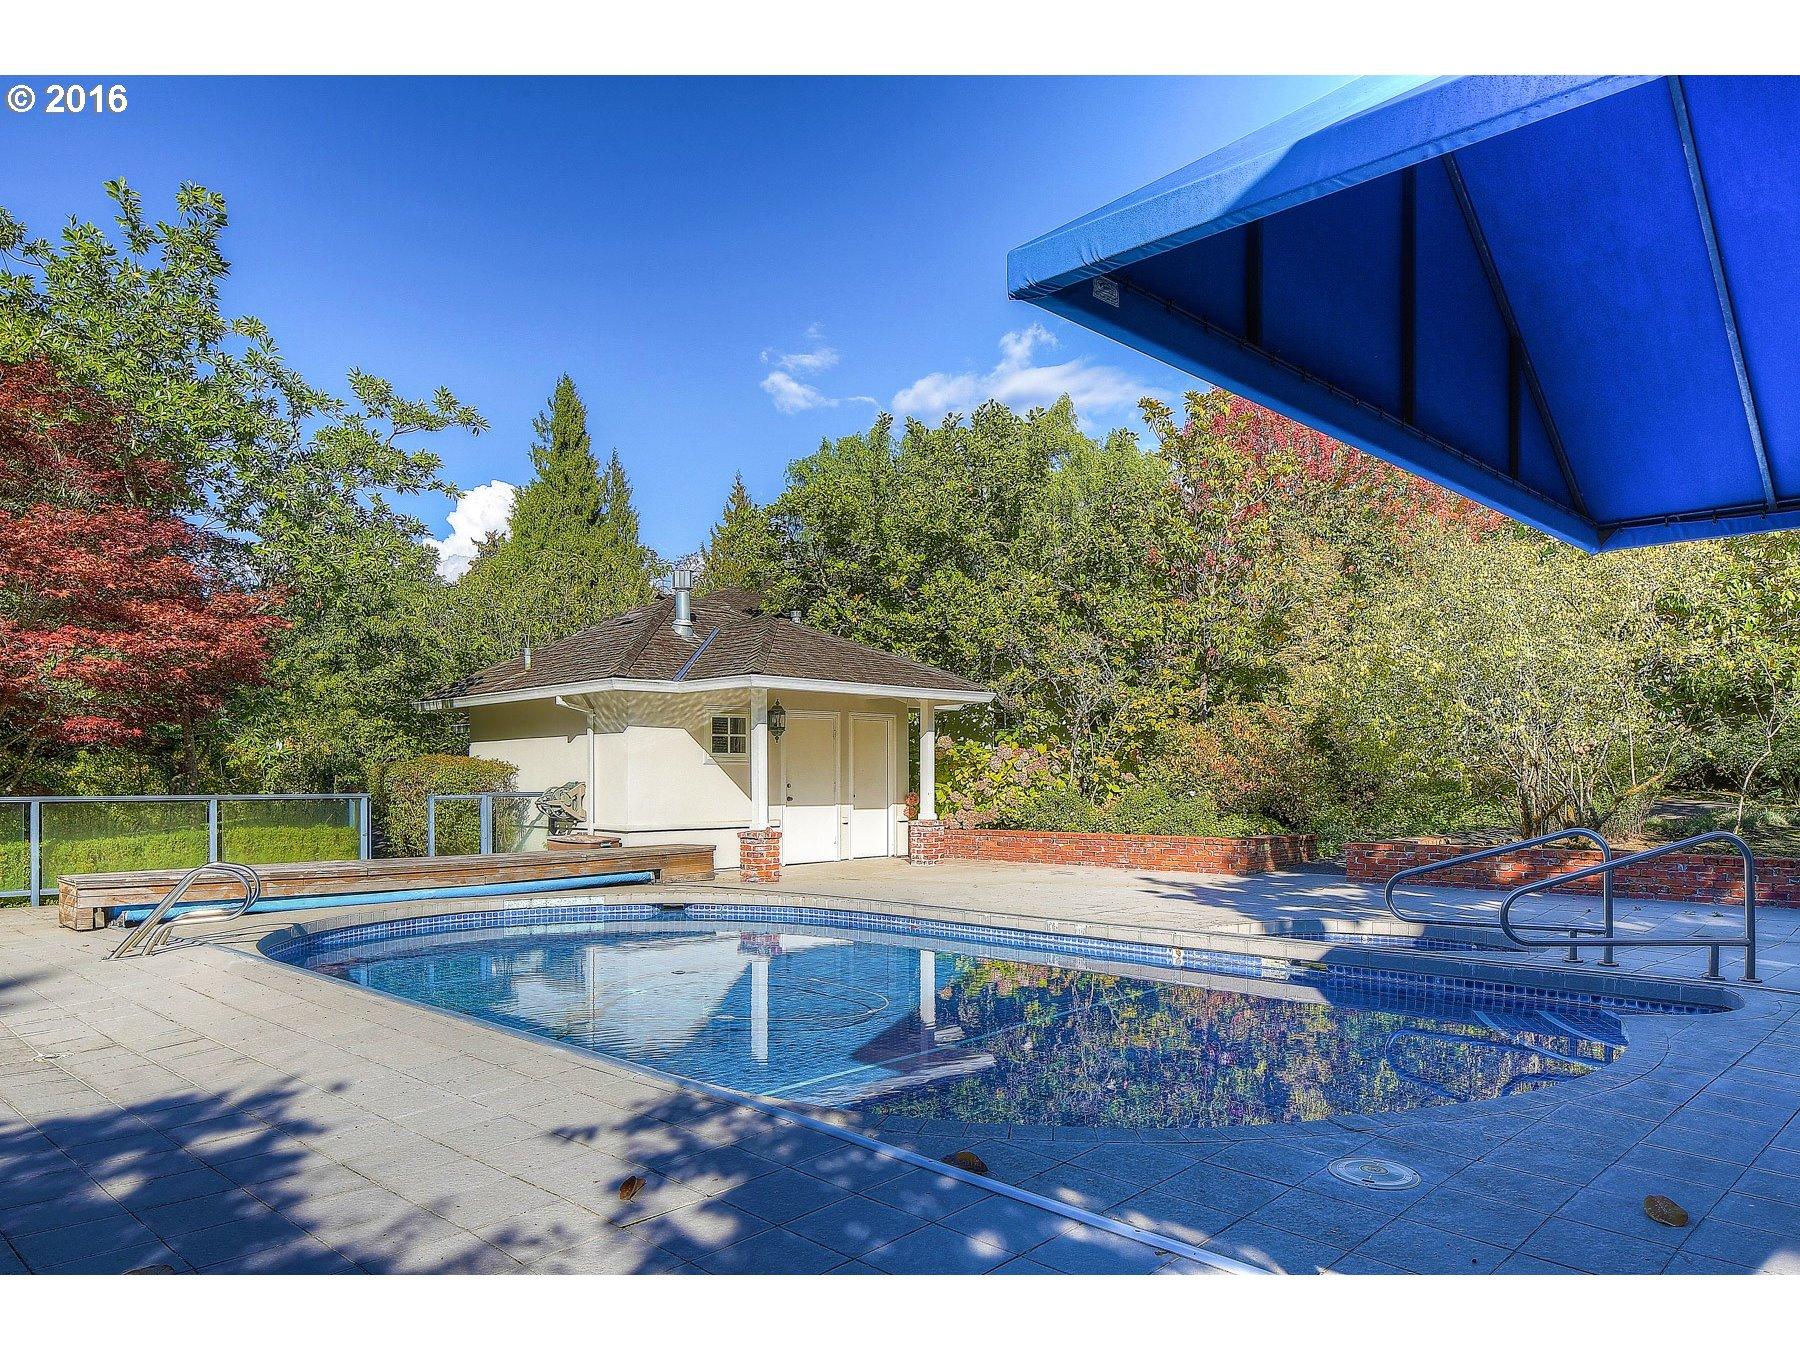 1804 Nw 136th St Vancouver Wa 98685 Vancouver Wa Real Estate